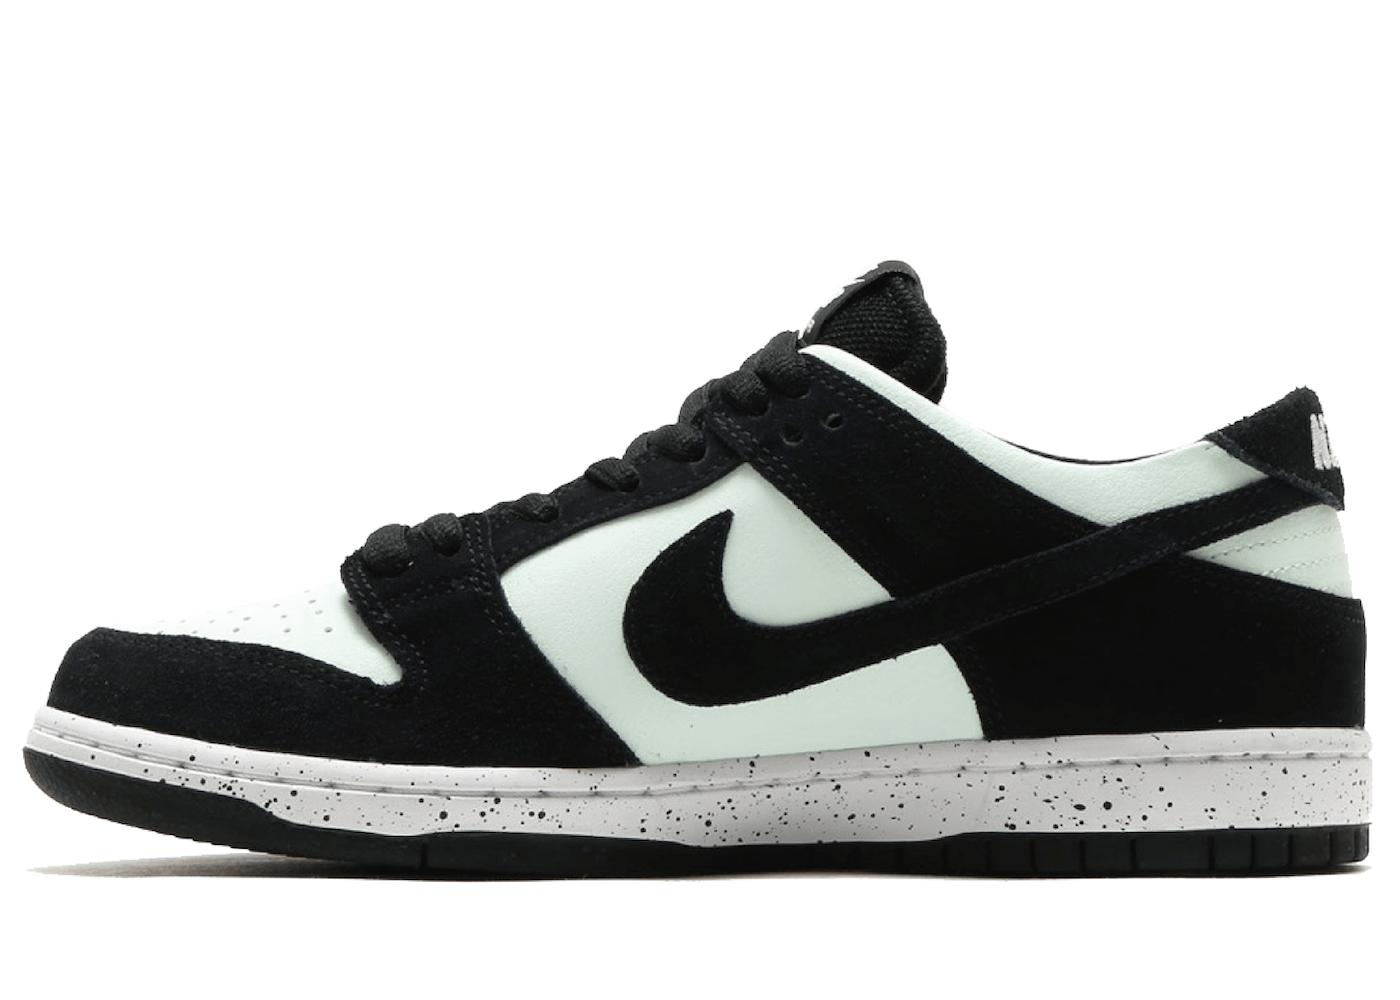 Nike SB Dunk Low Barely Greenの写真